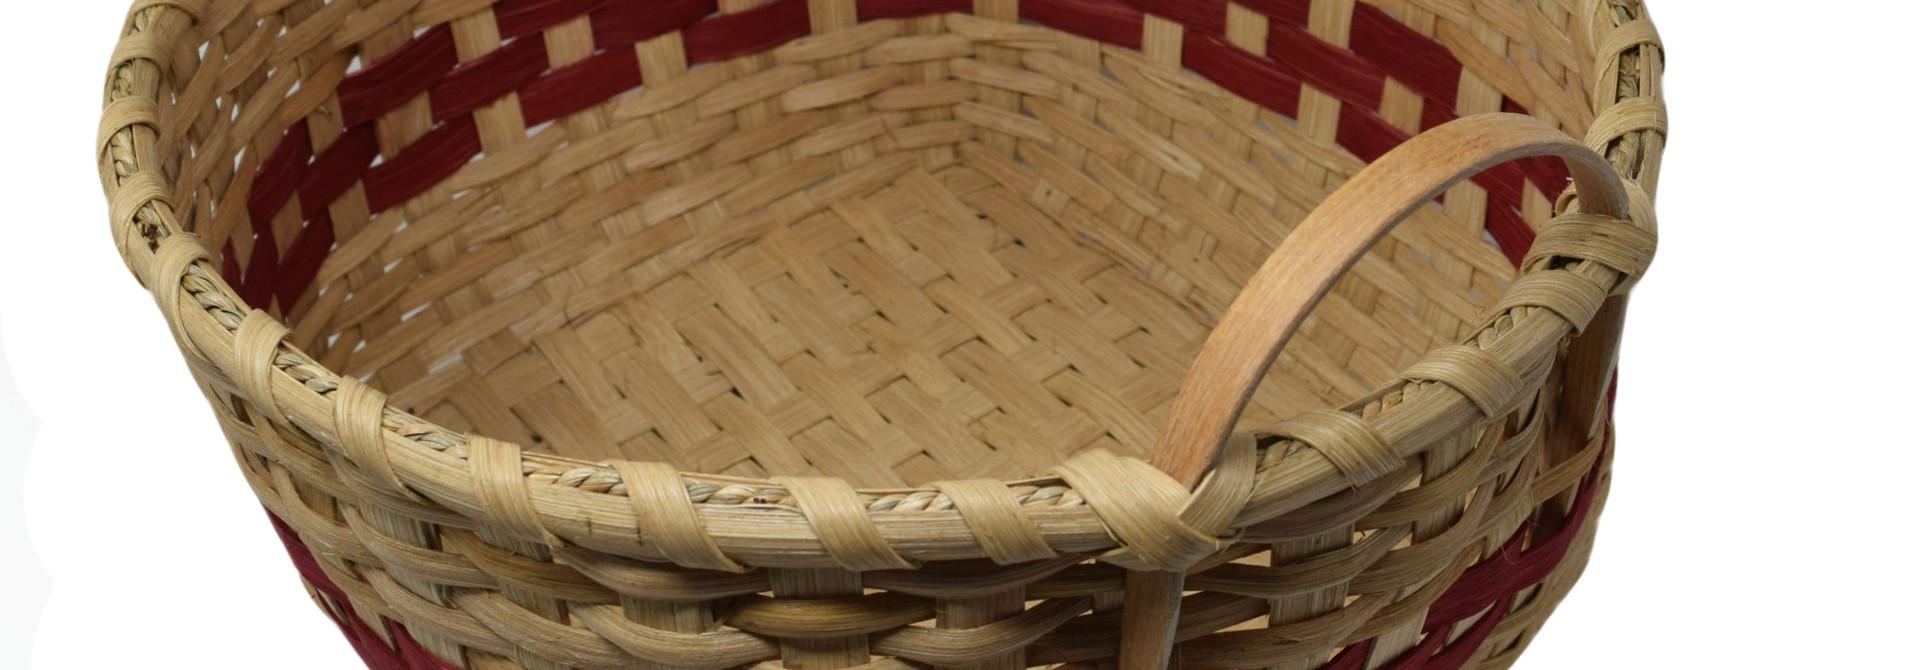 Toy Basket Natural